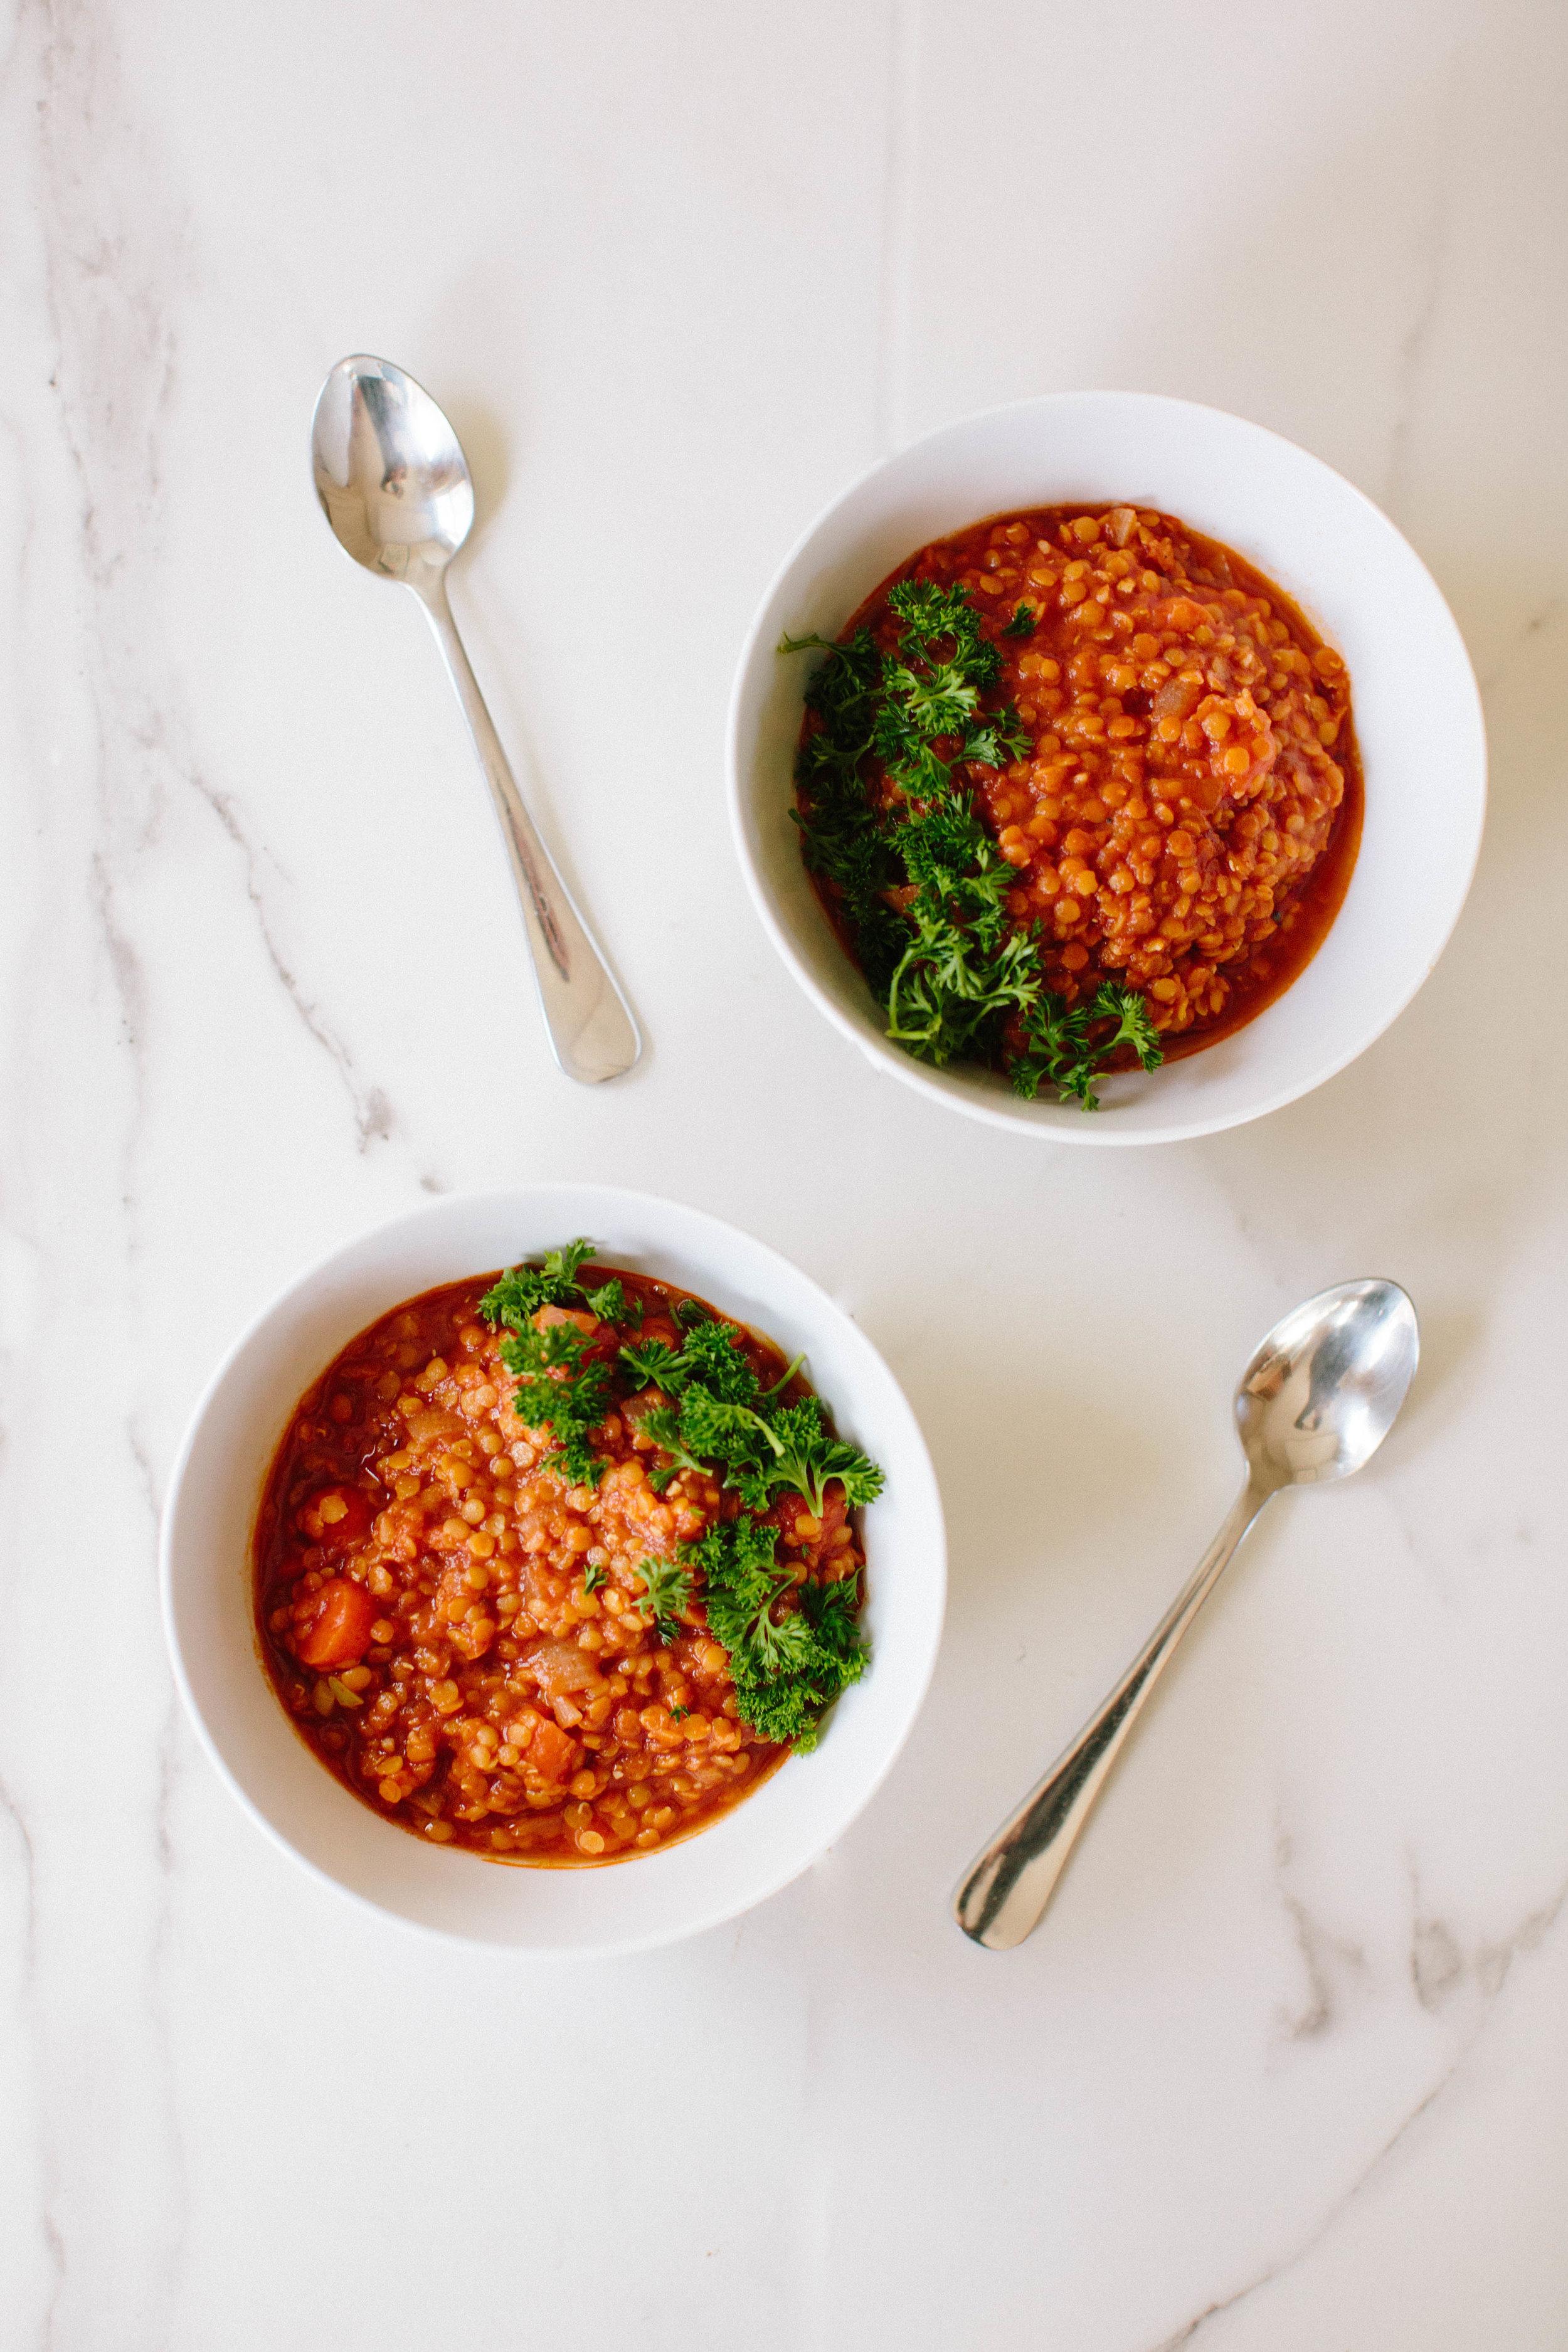 jennahazelphotography-cozy-winter-lentil-stew-6630.jpg